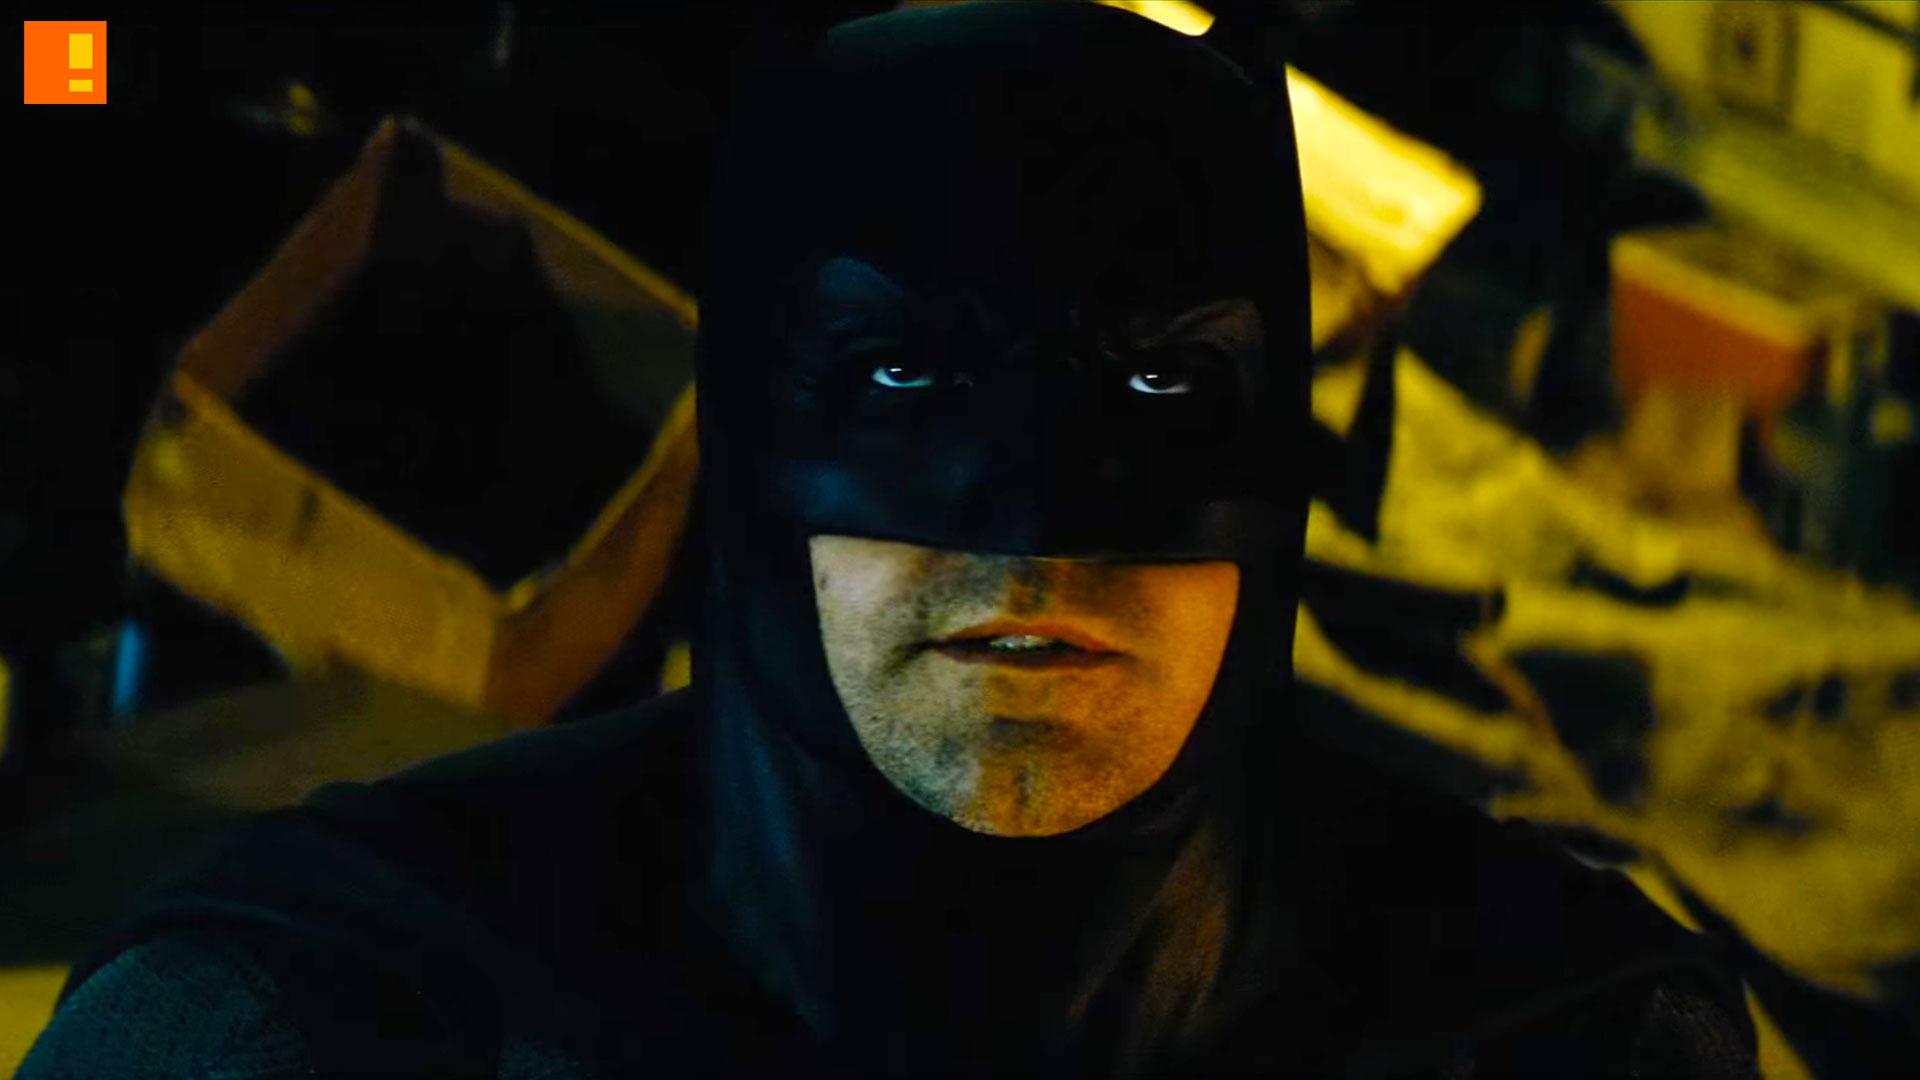 batman. ben affleck. batman v superman. dawn of justice. dc comics. warner bros. pictures. entertainment on tap. the action pixel. @theactionpixel